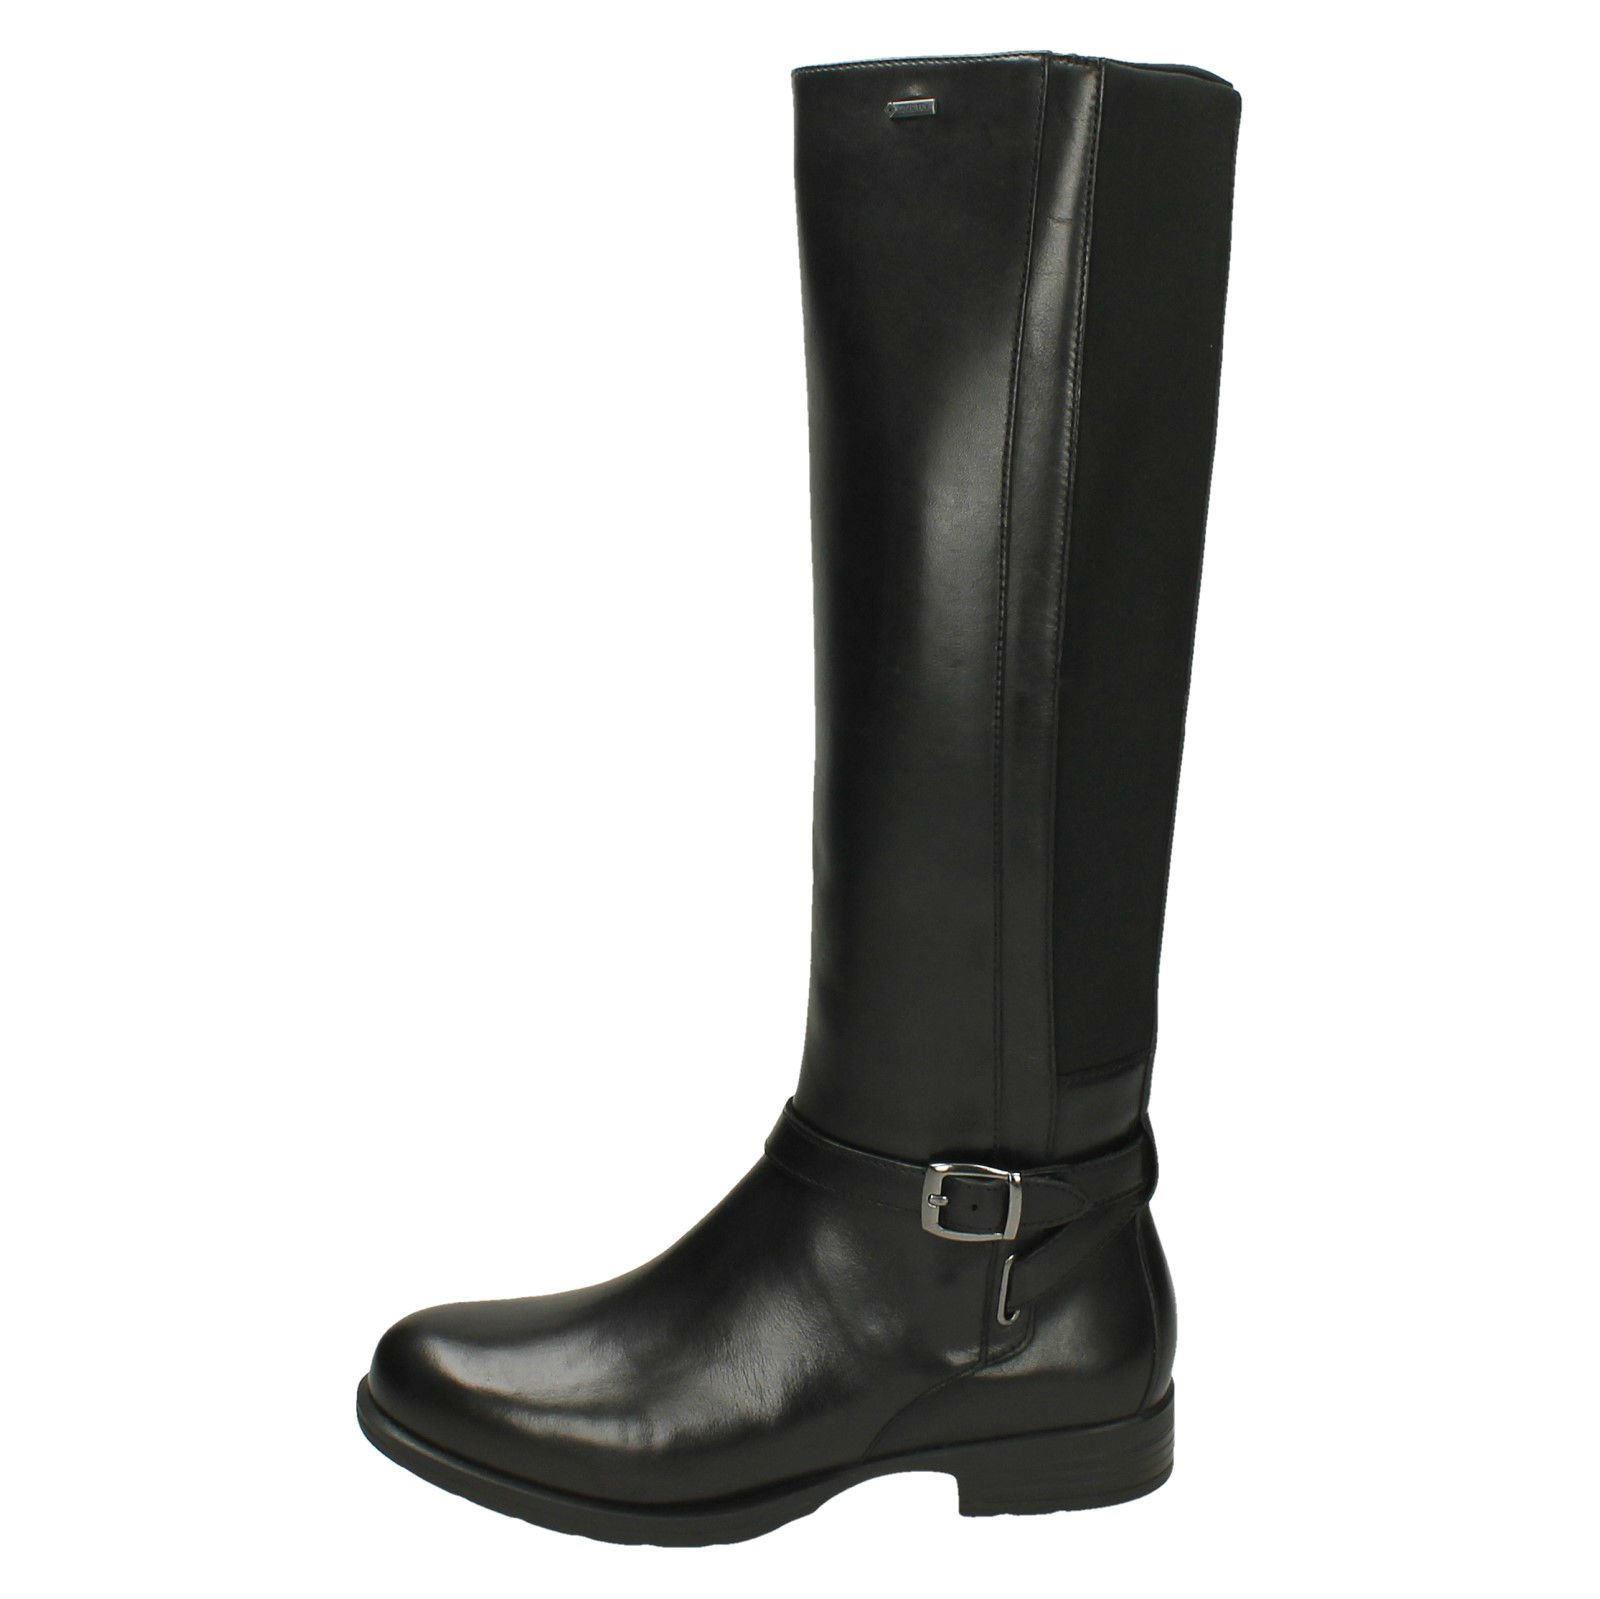 Cheshunthi Casual Gtx Boots High Ladies Clarks Black Knee 1zq74v